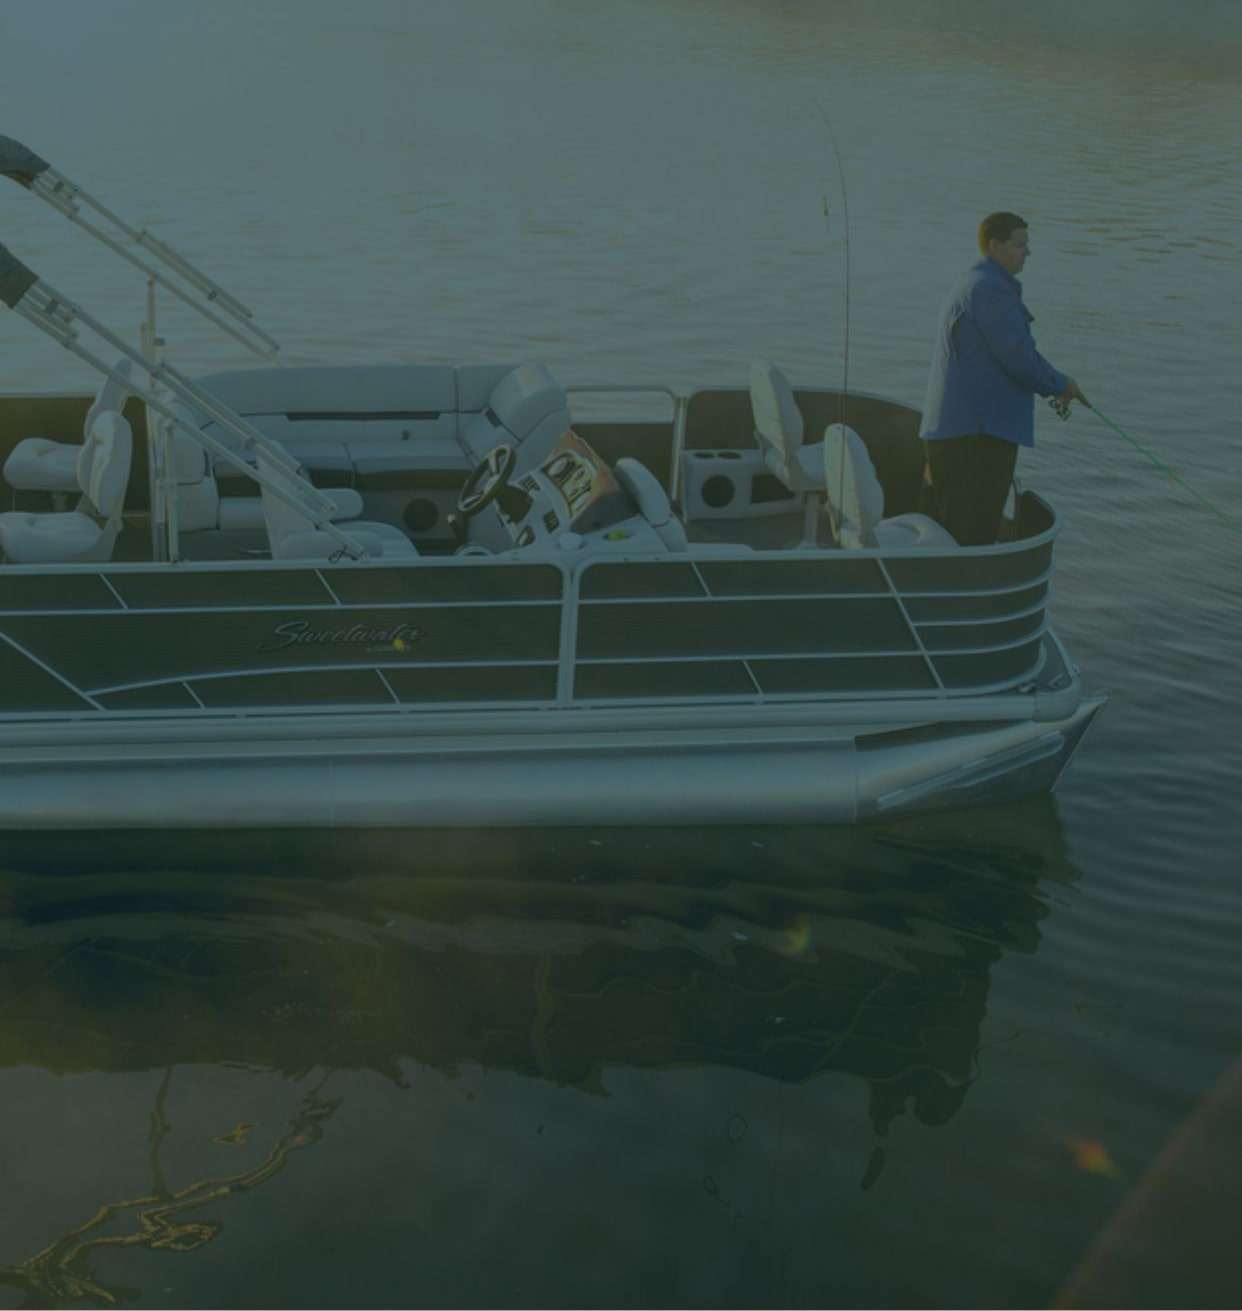 Home Boat City Marine Portage, MI (269) 327-3008